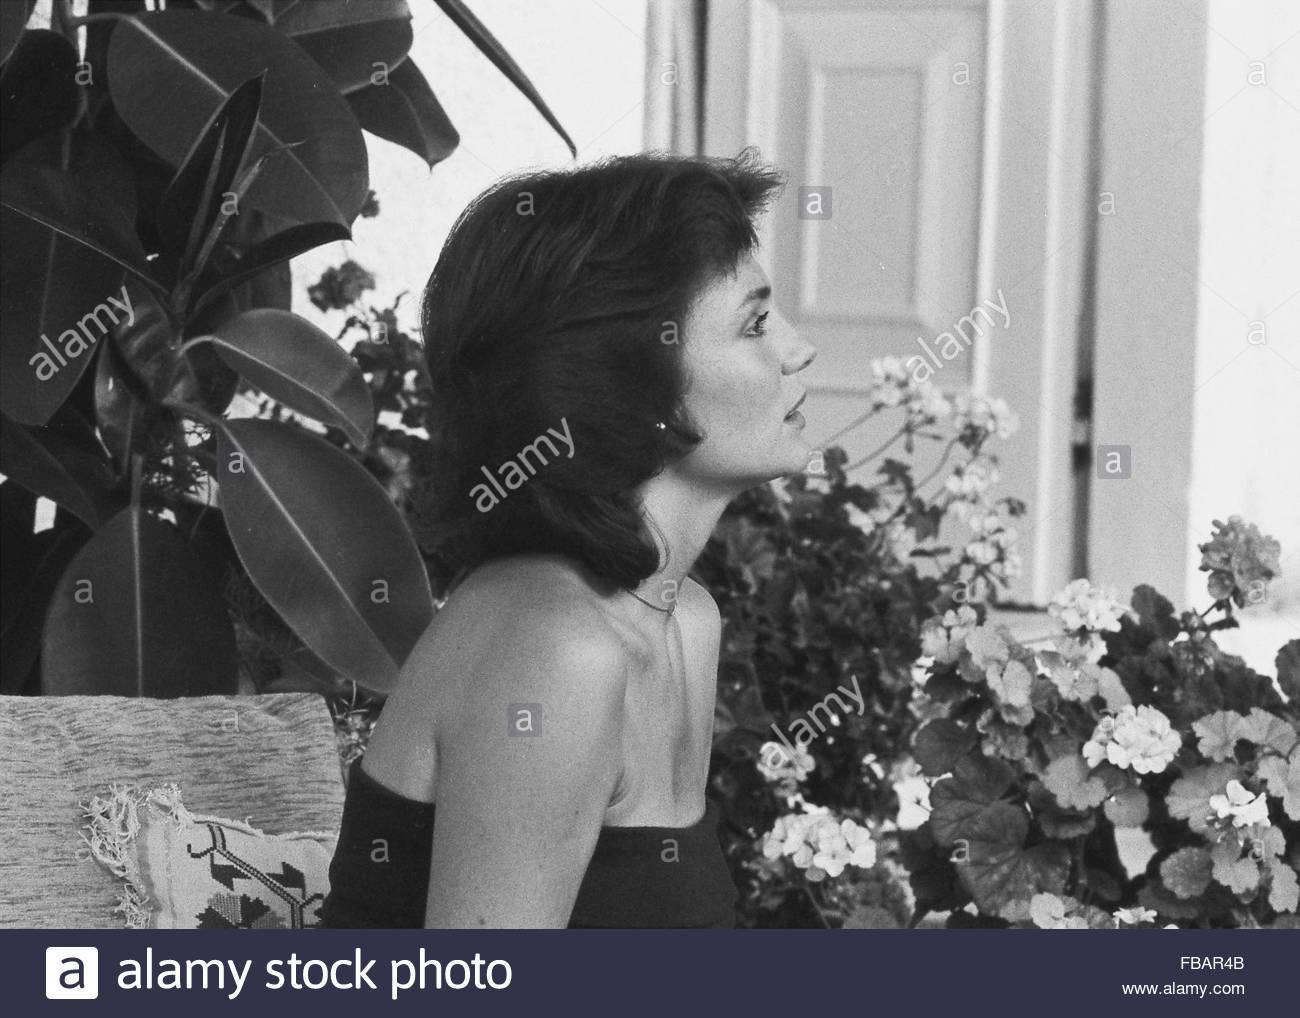 Portia Nelson,Gina Alajar (b. 1959) Hot pics Shiri Appleby,Julia Hart